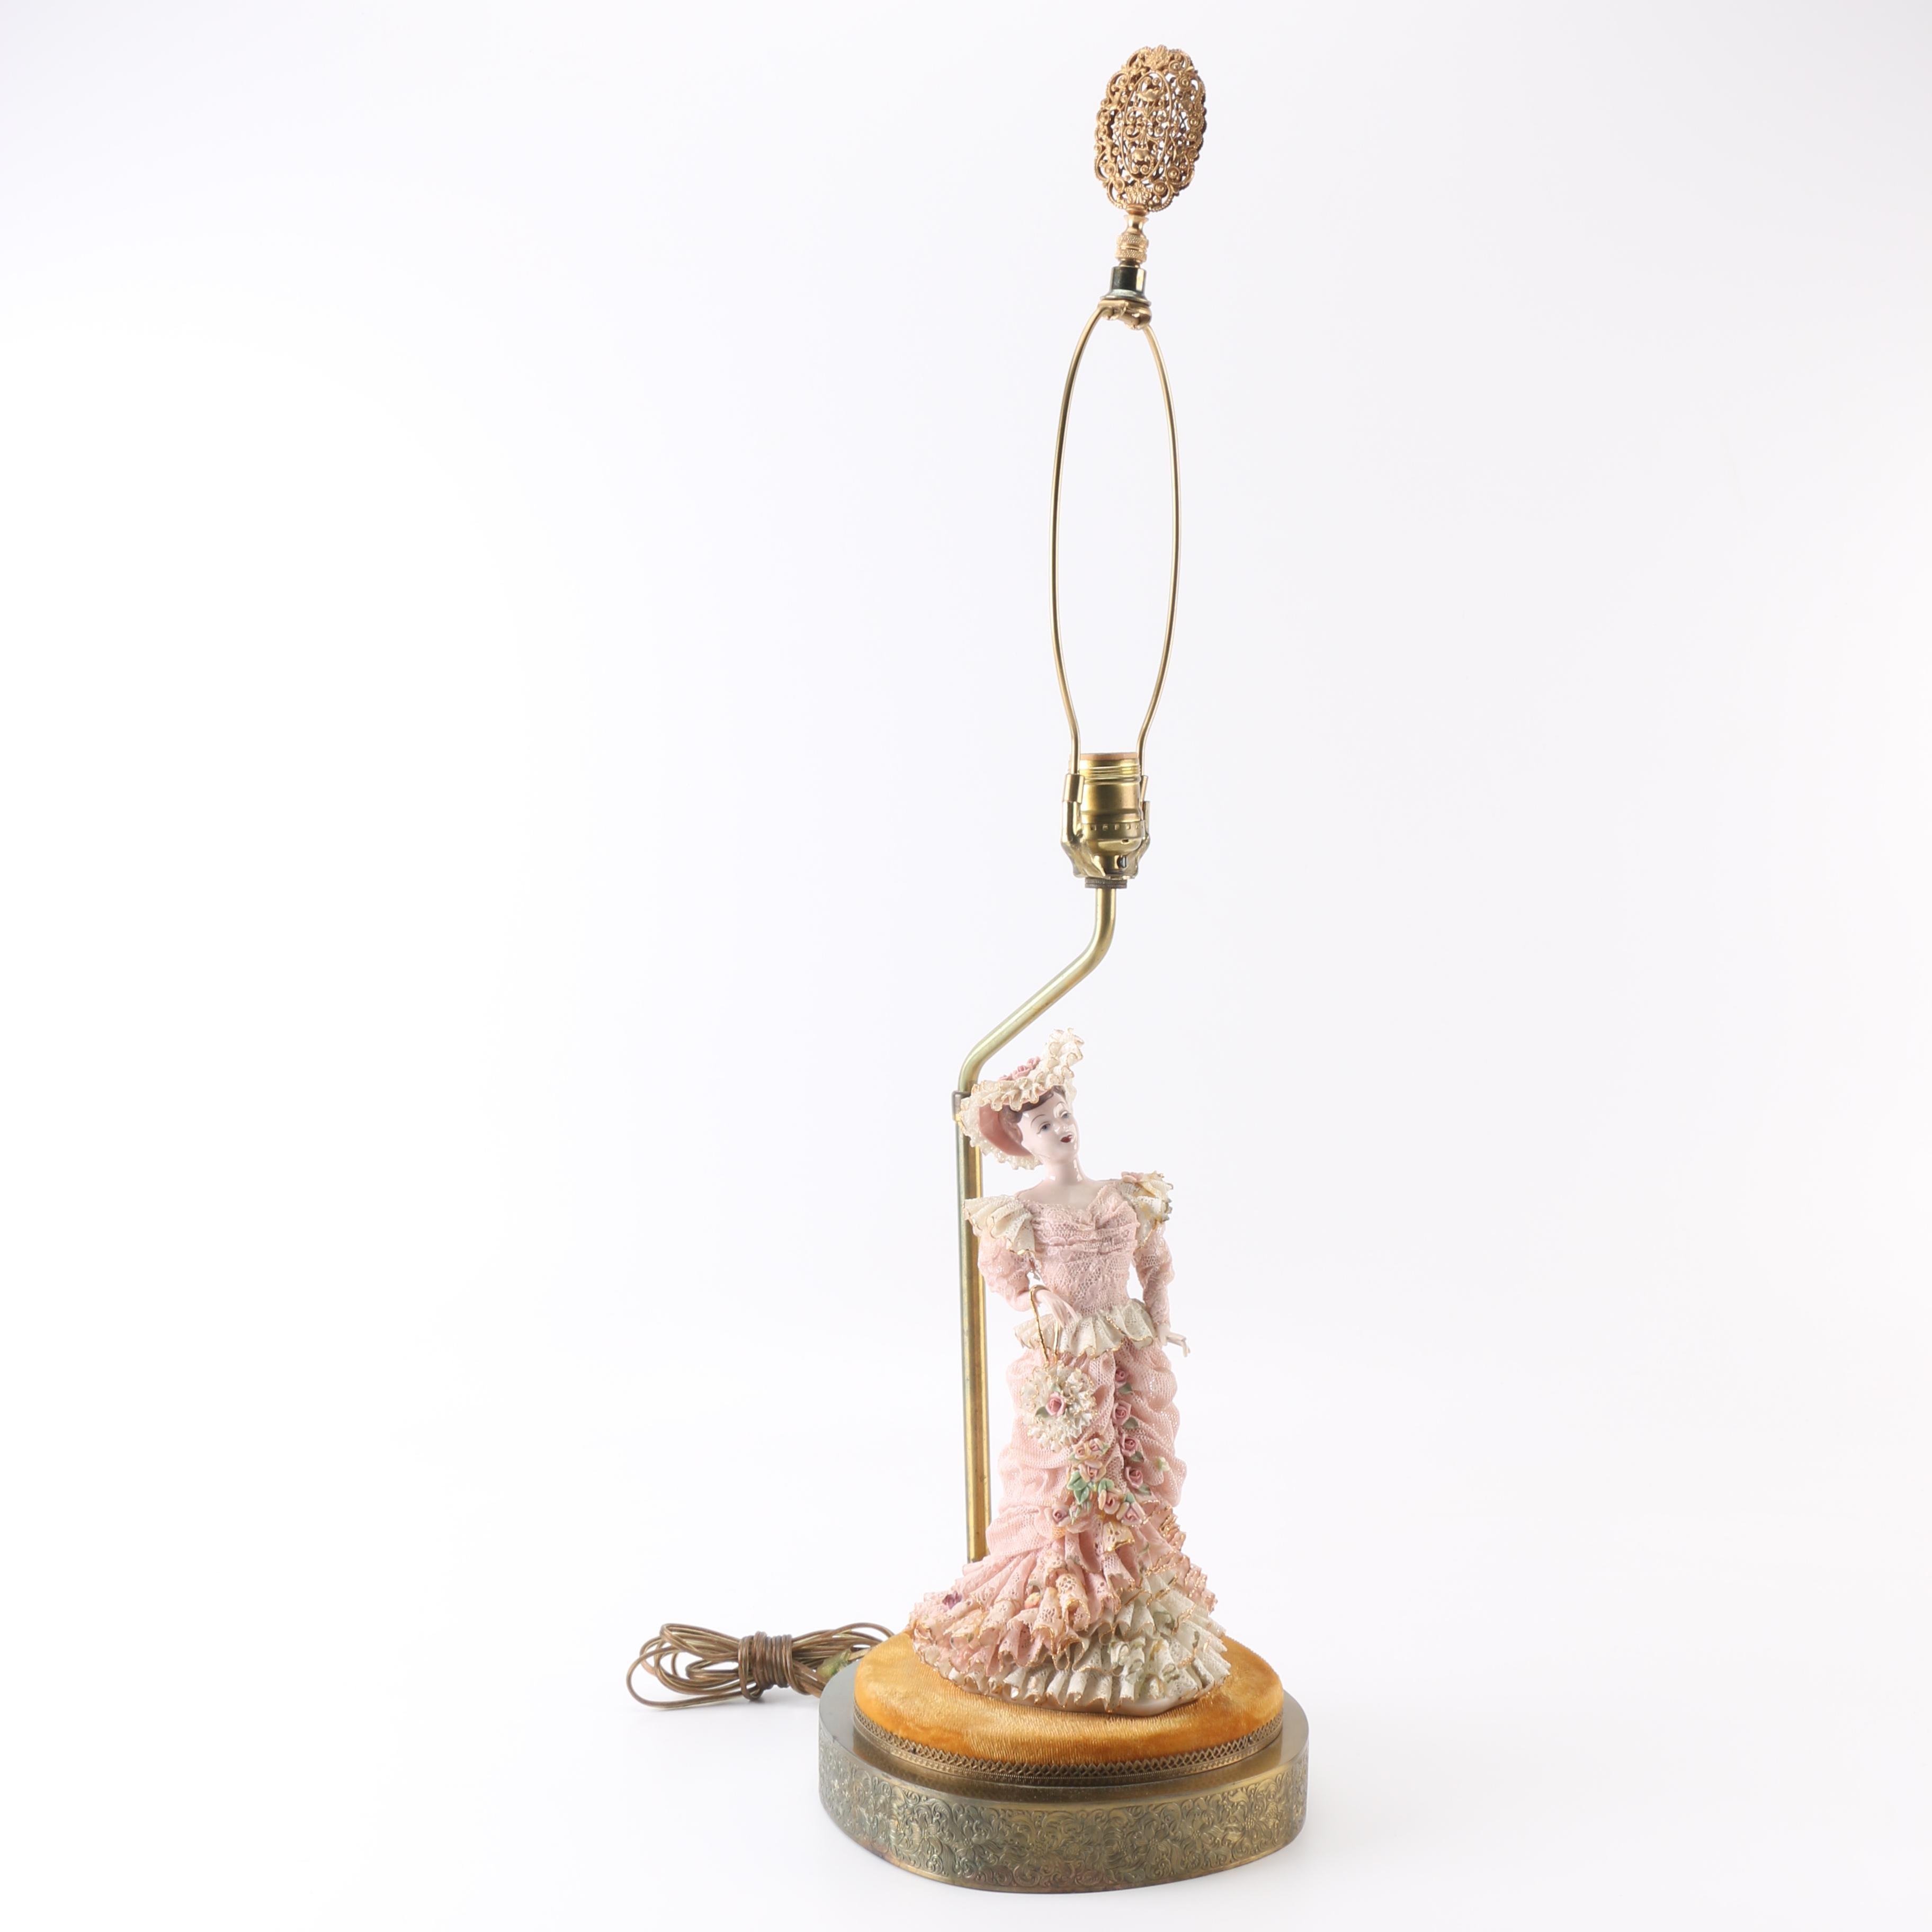 Art Nouveau Ceramic Figural Lamp